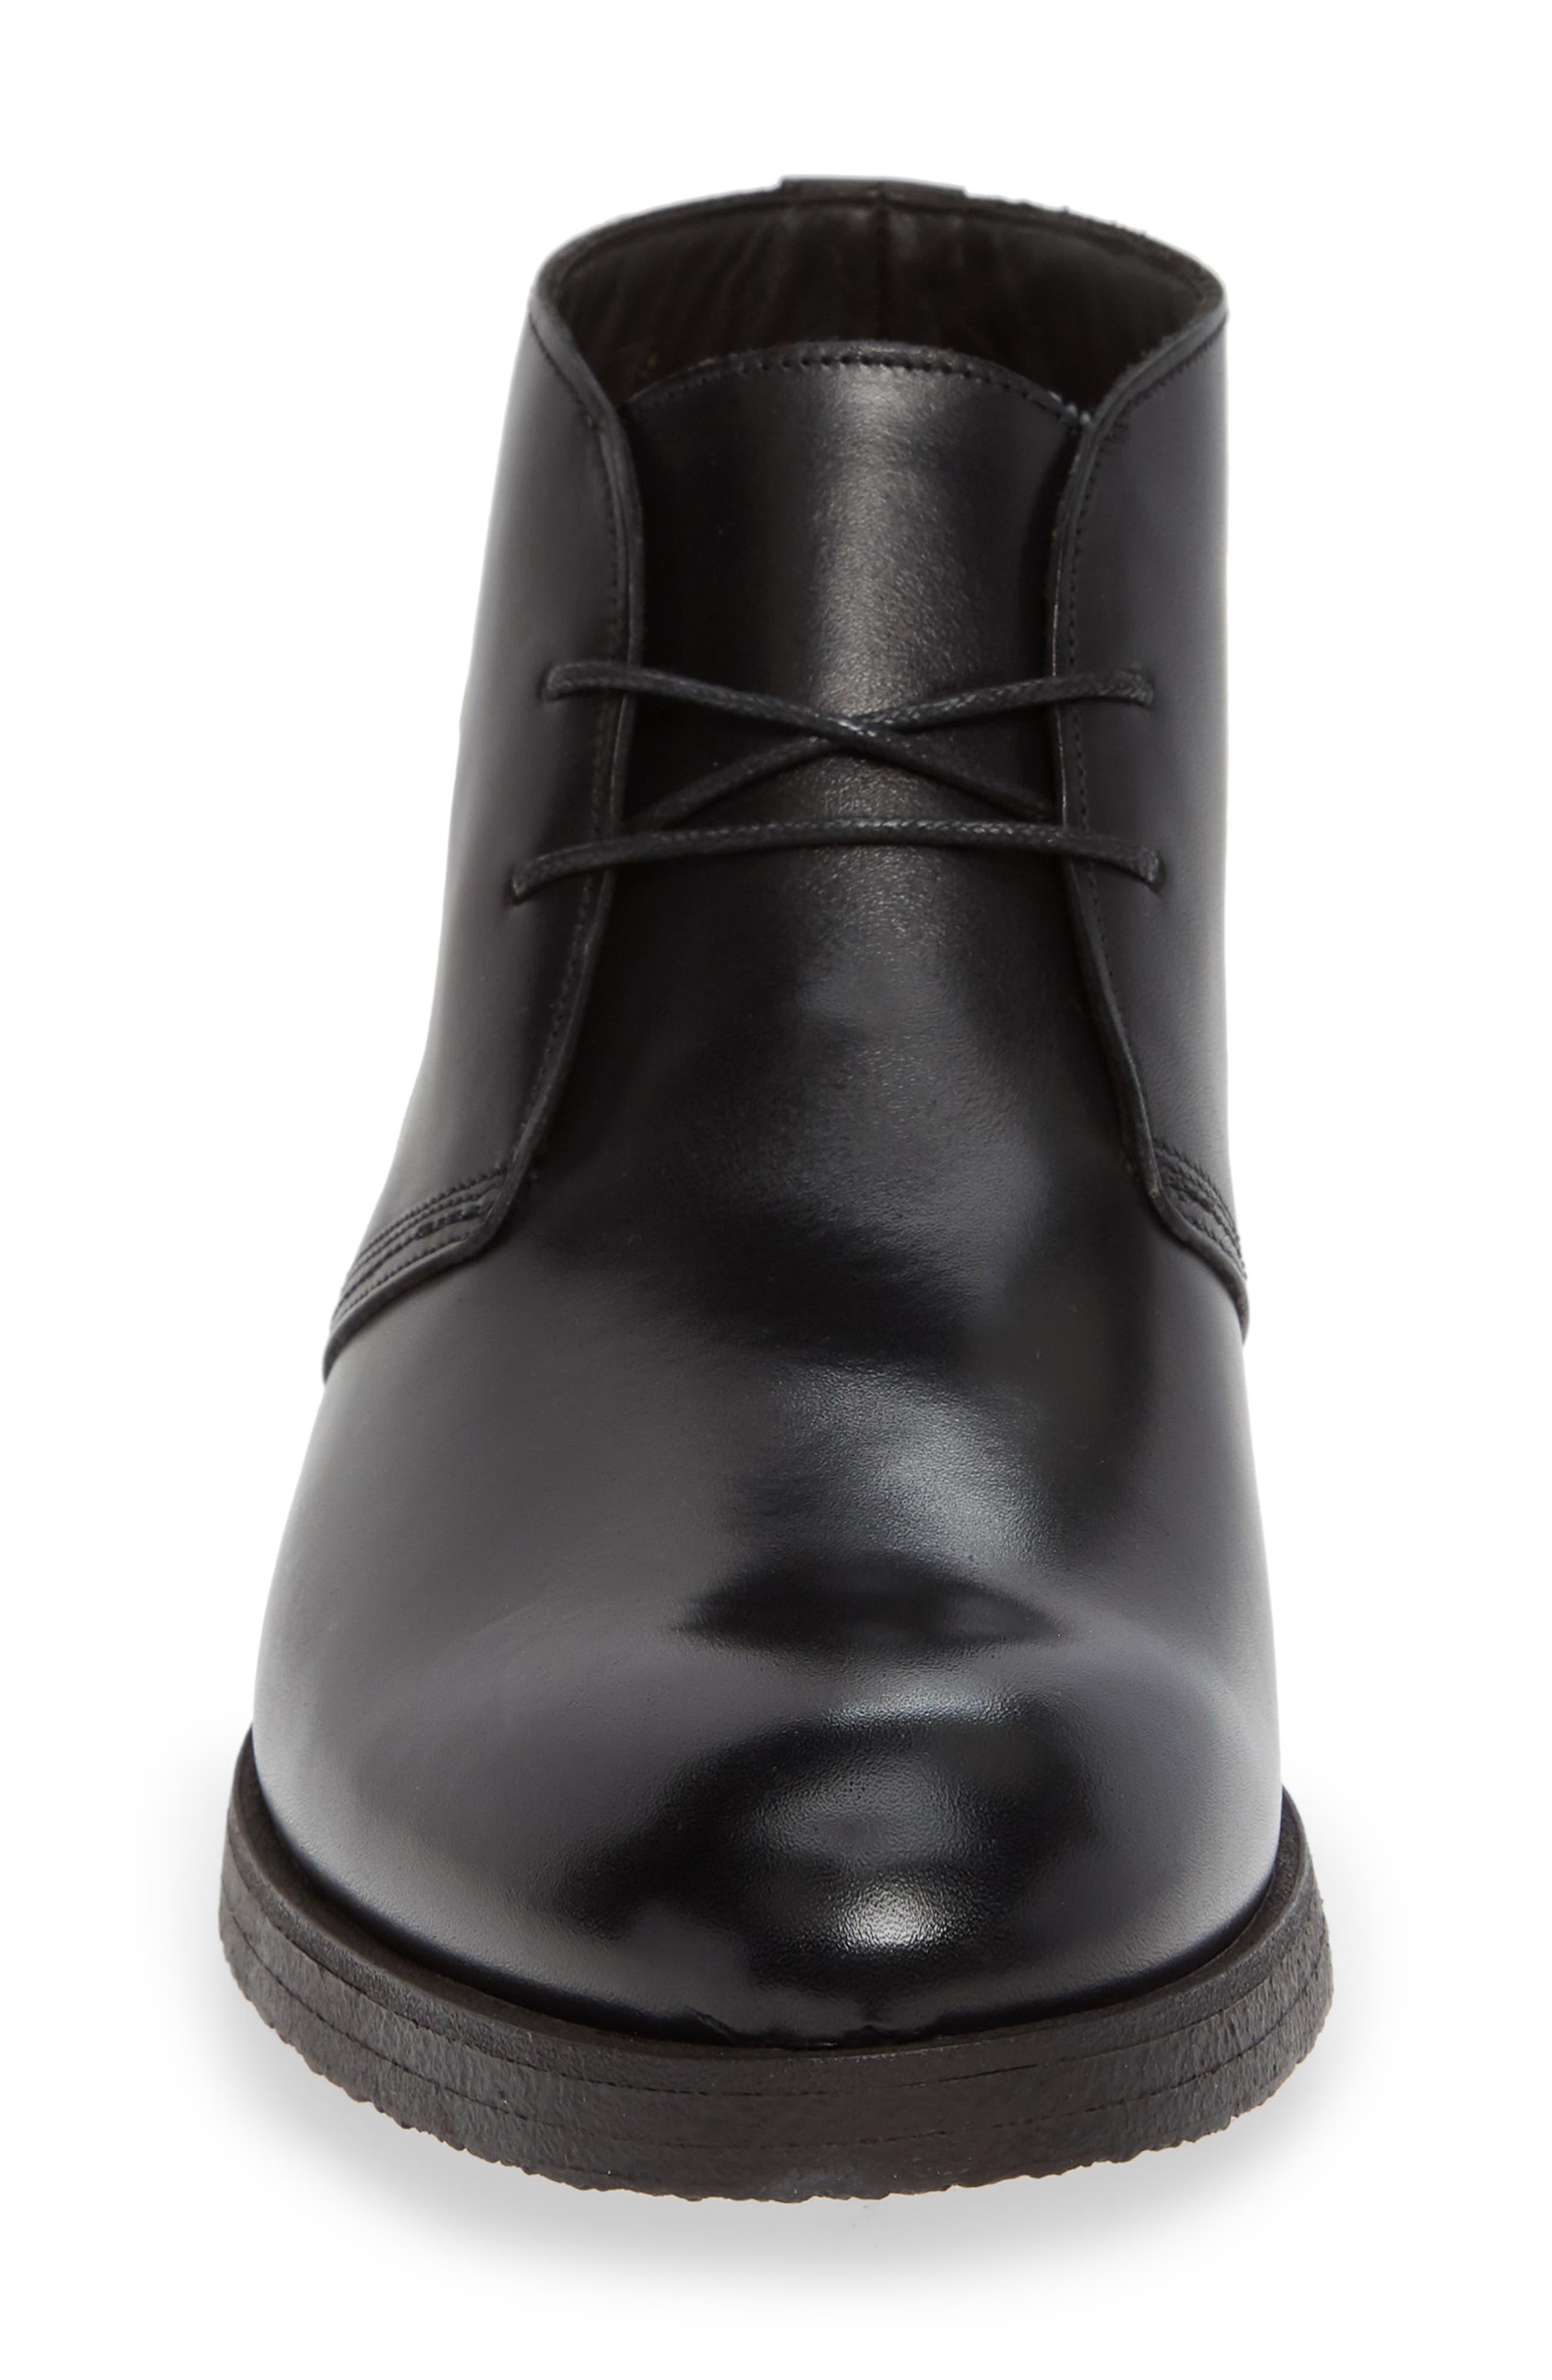 Corvera Chukka Boot,                             Alternate thumbnail 4, color,                             BERRY BLACK LEATHER